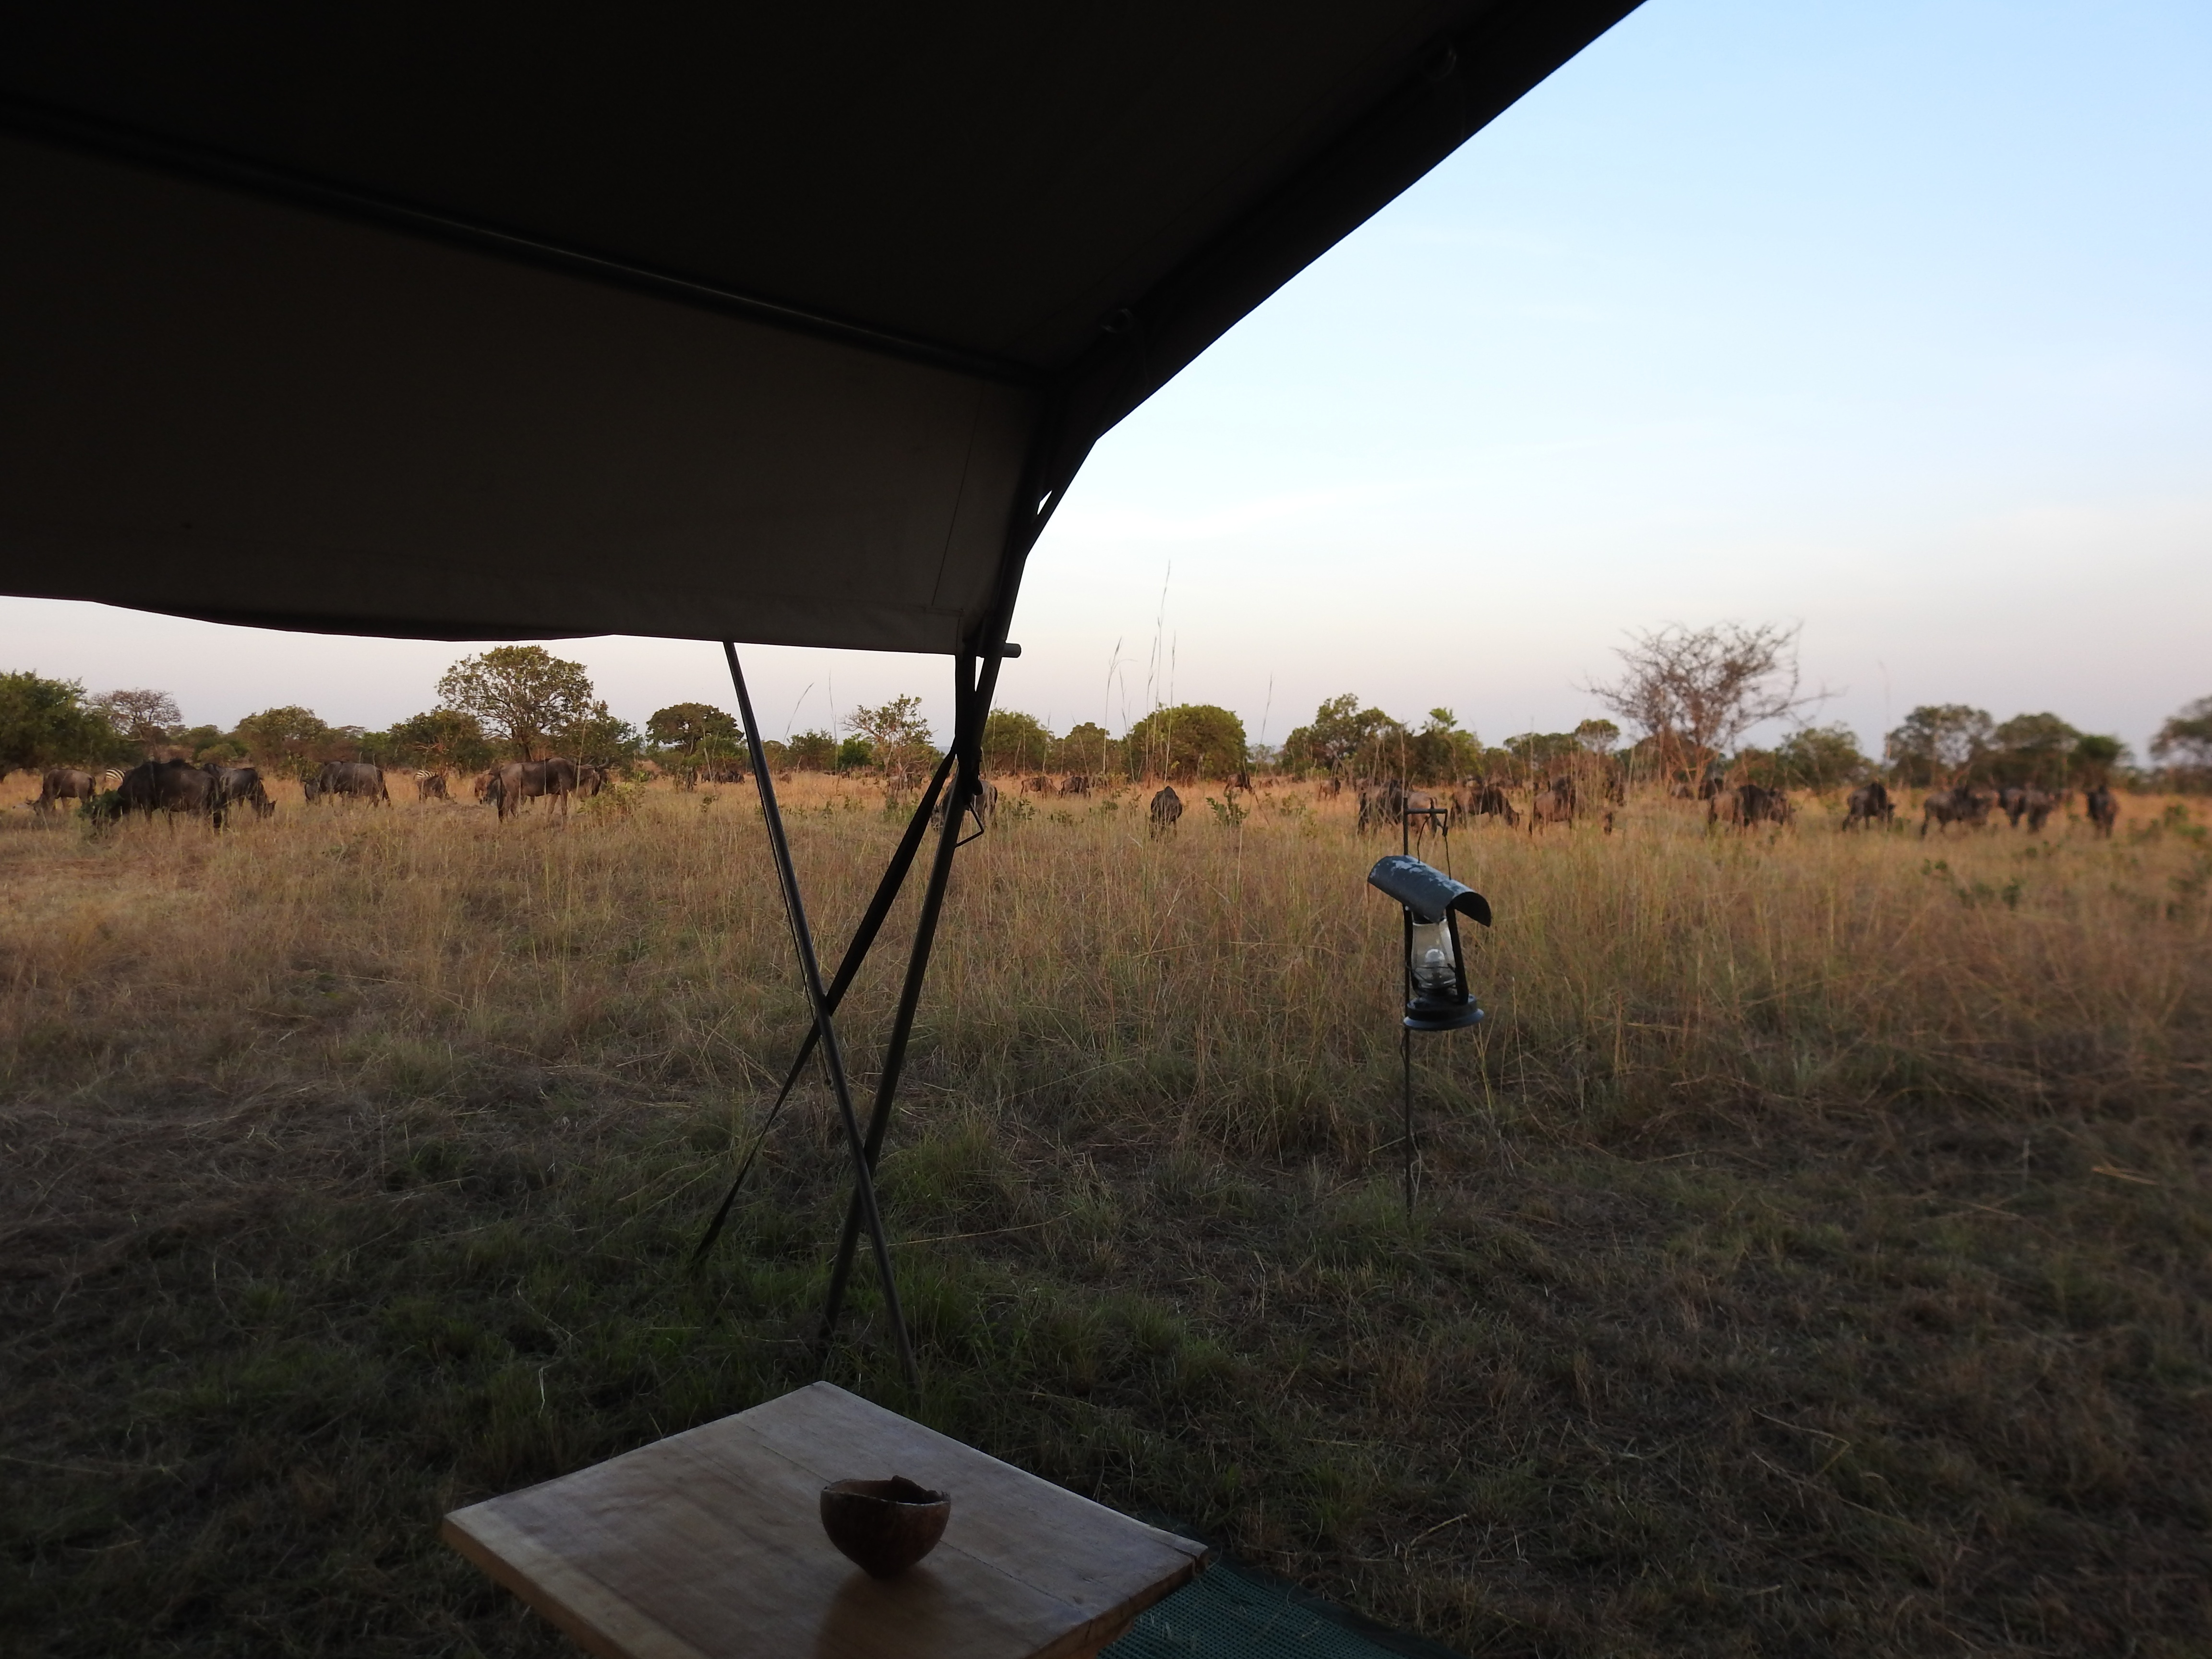 Wildebeest_from_tent.jpg